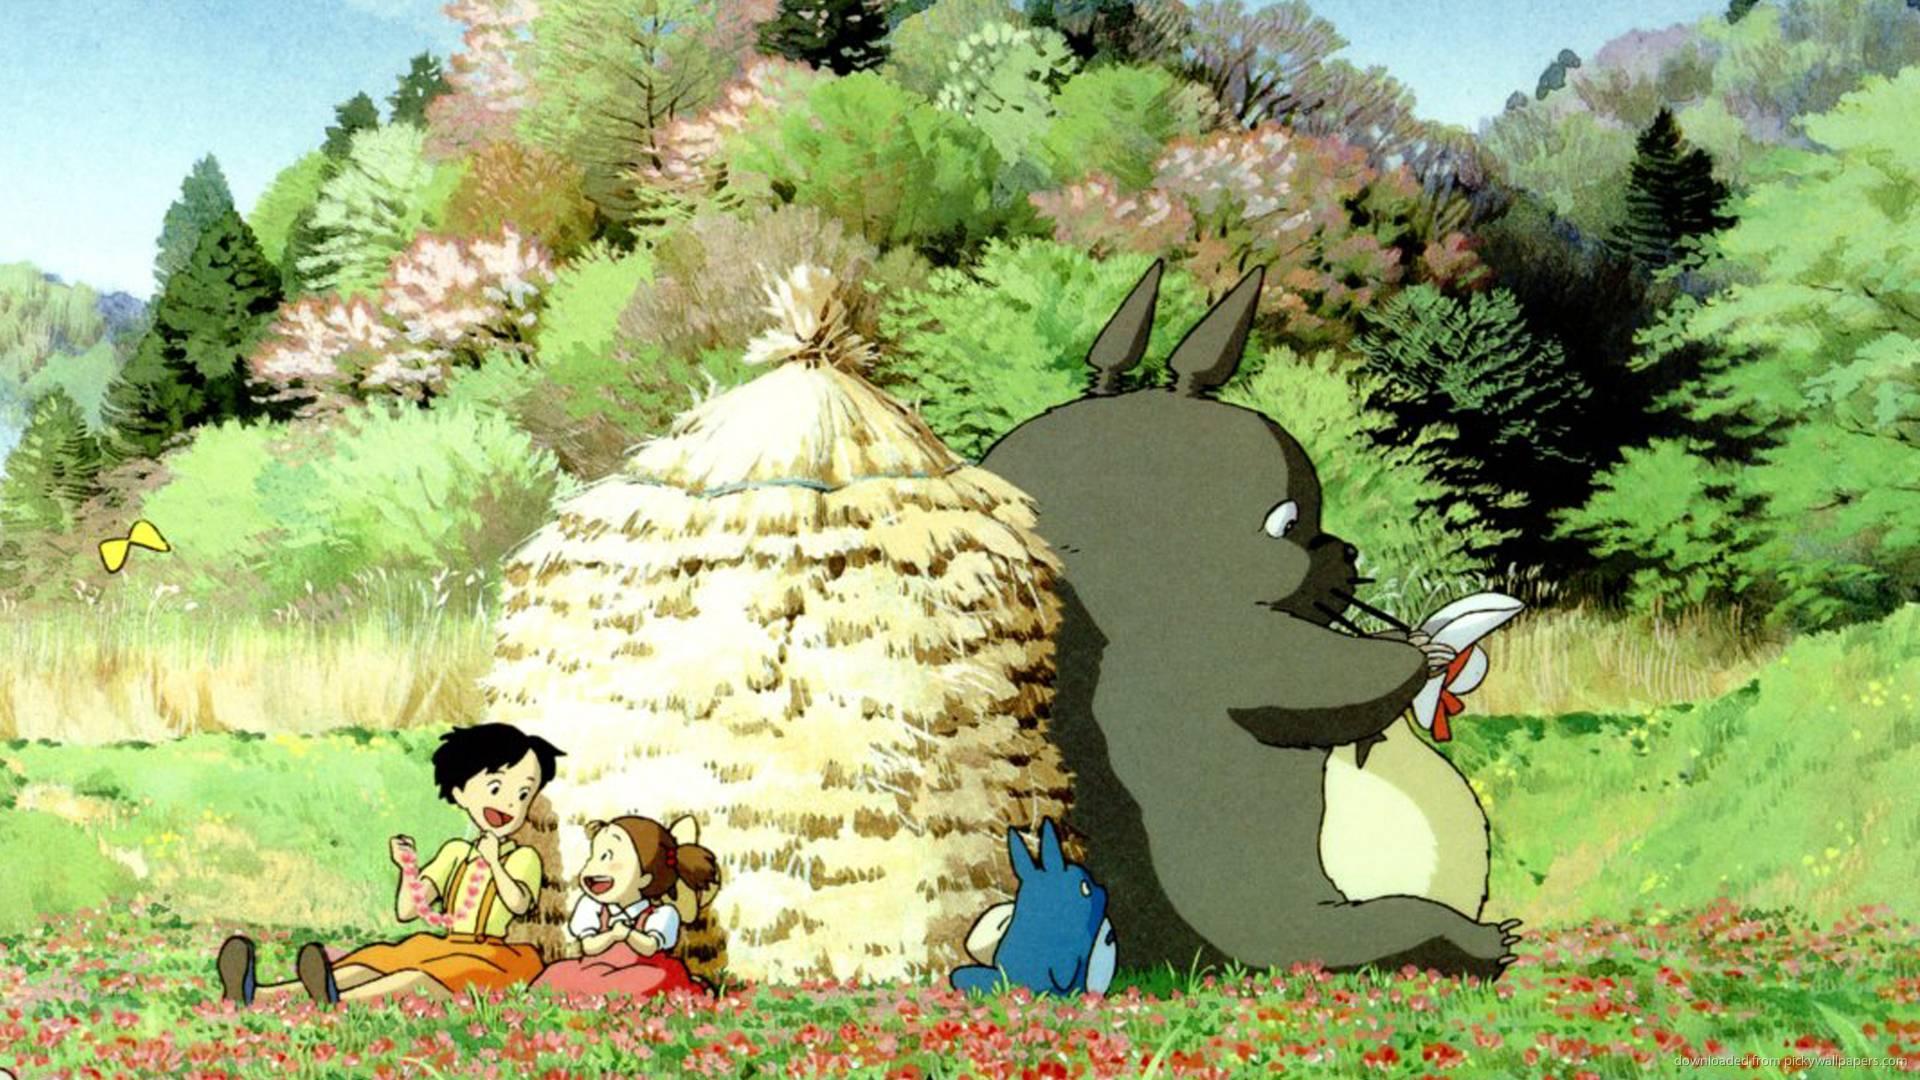 My Neighbor Totoro Wallpapers - Wallpaper Cave